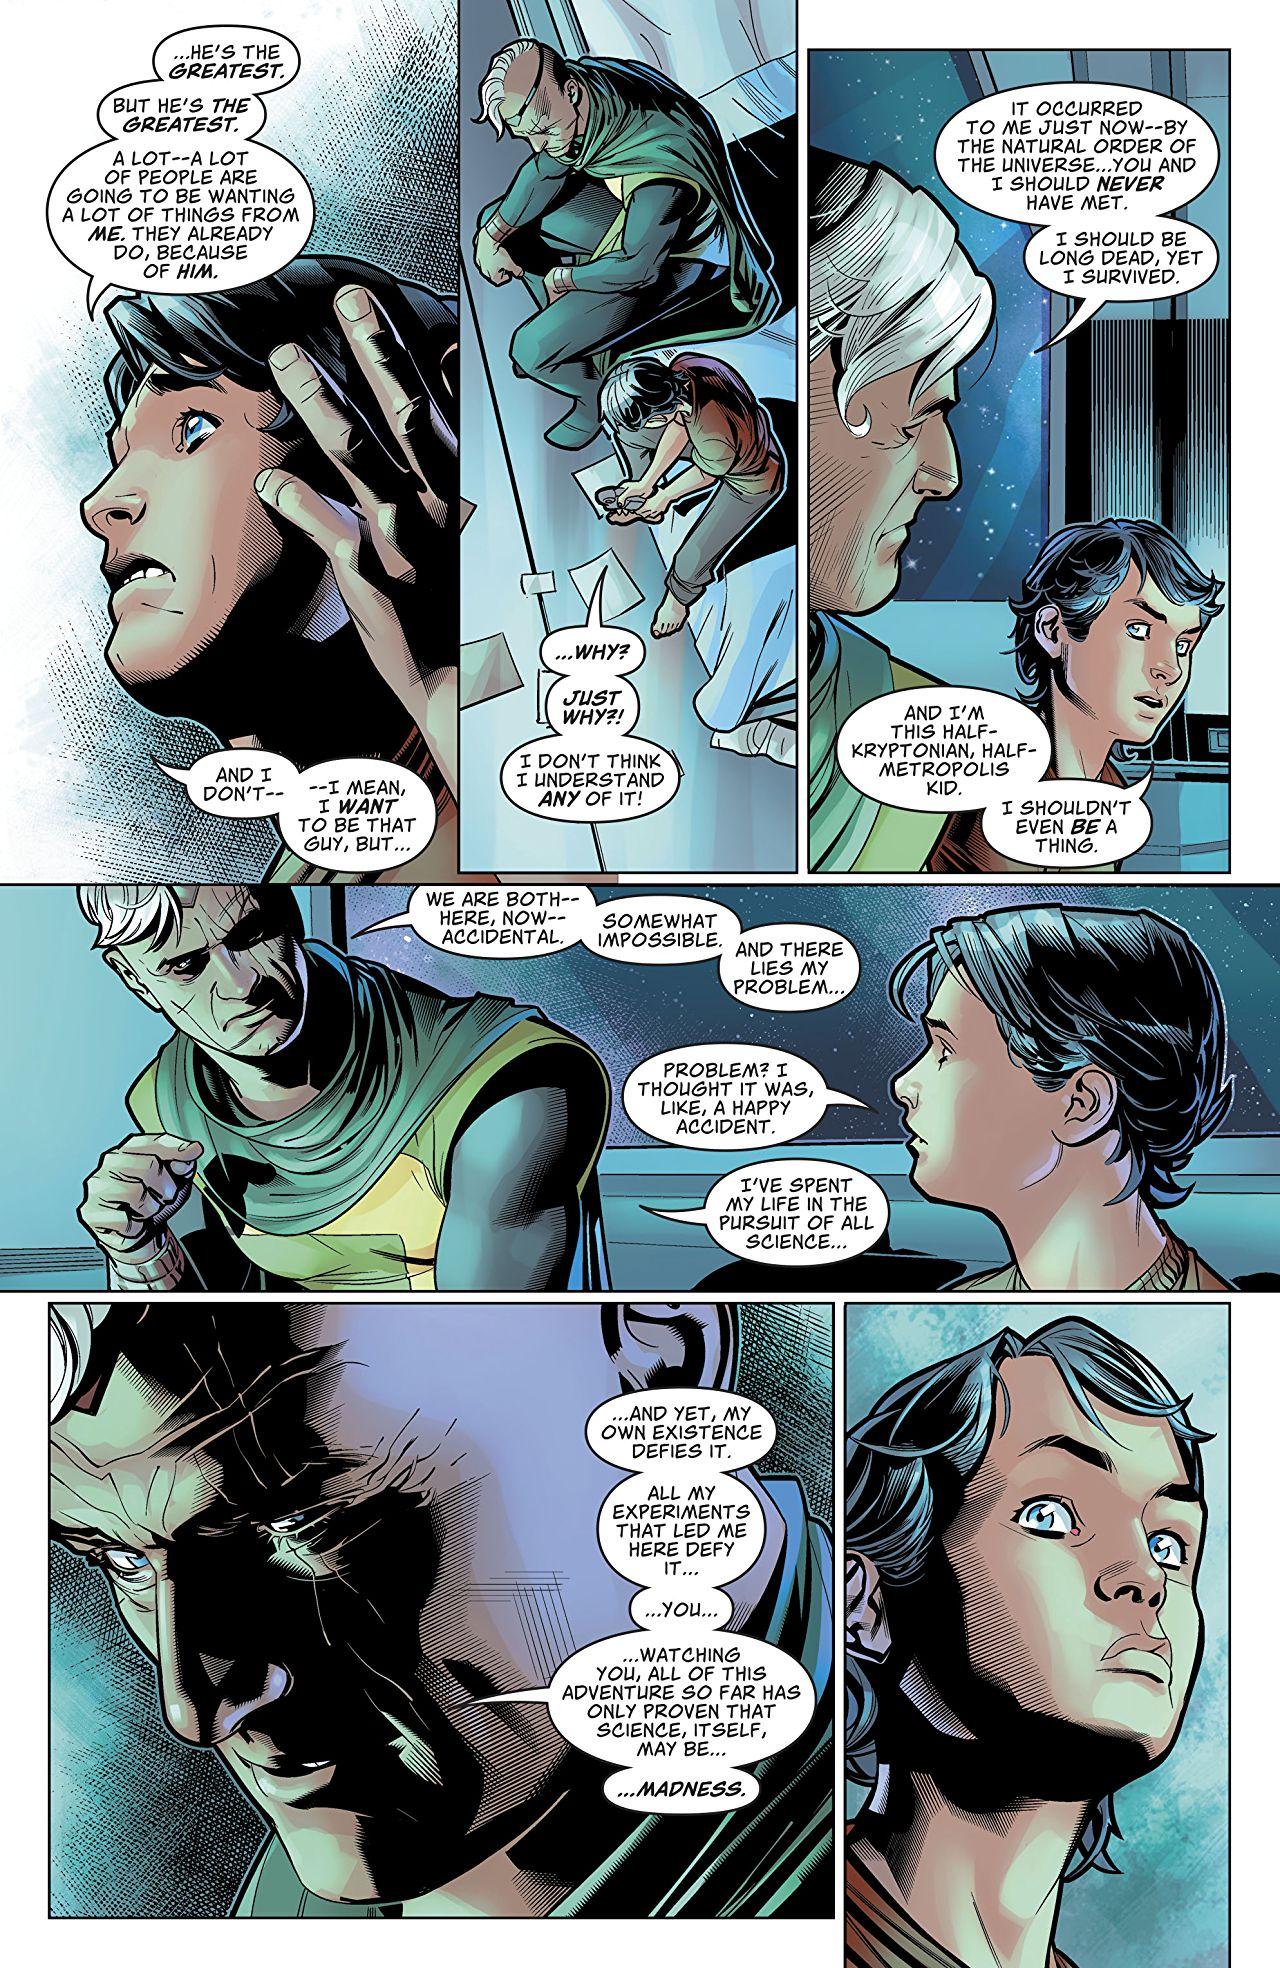 Superman 8 3.jpg